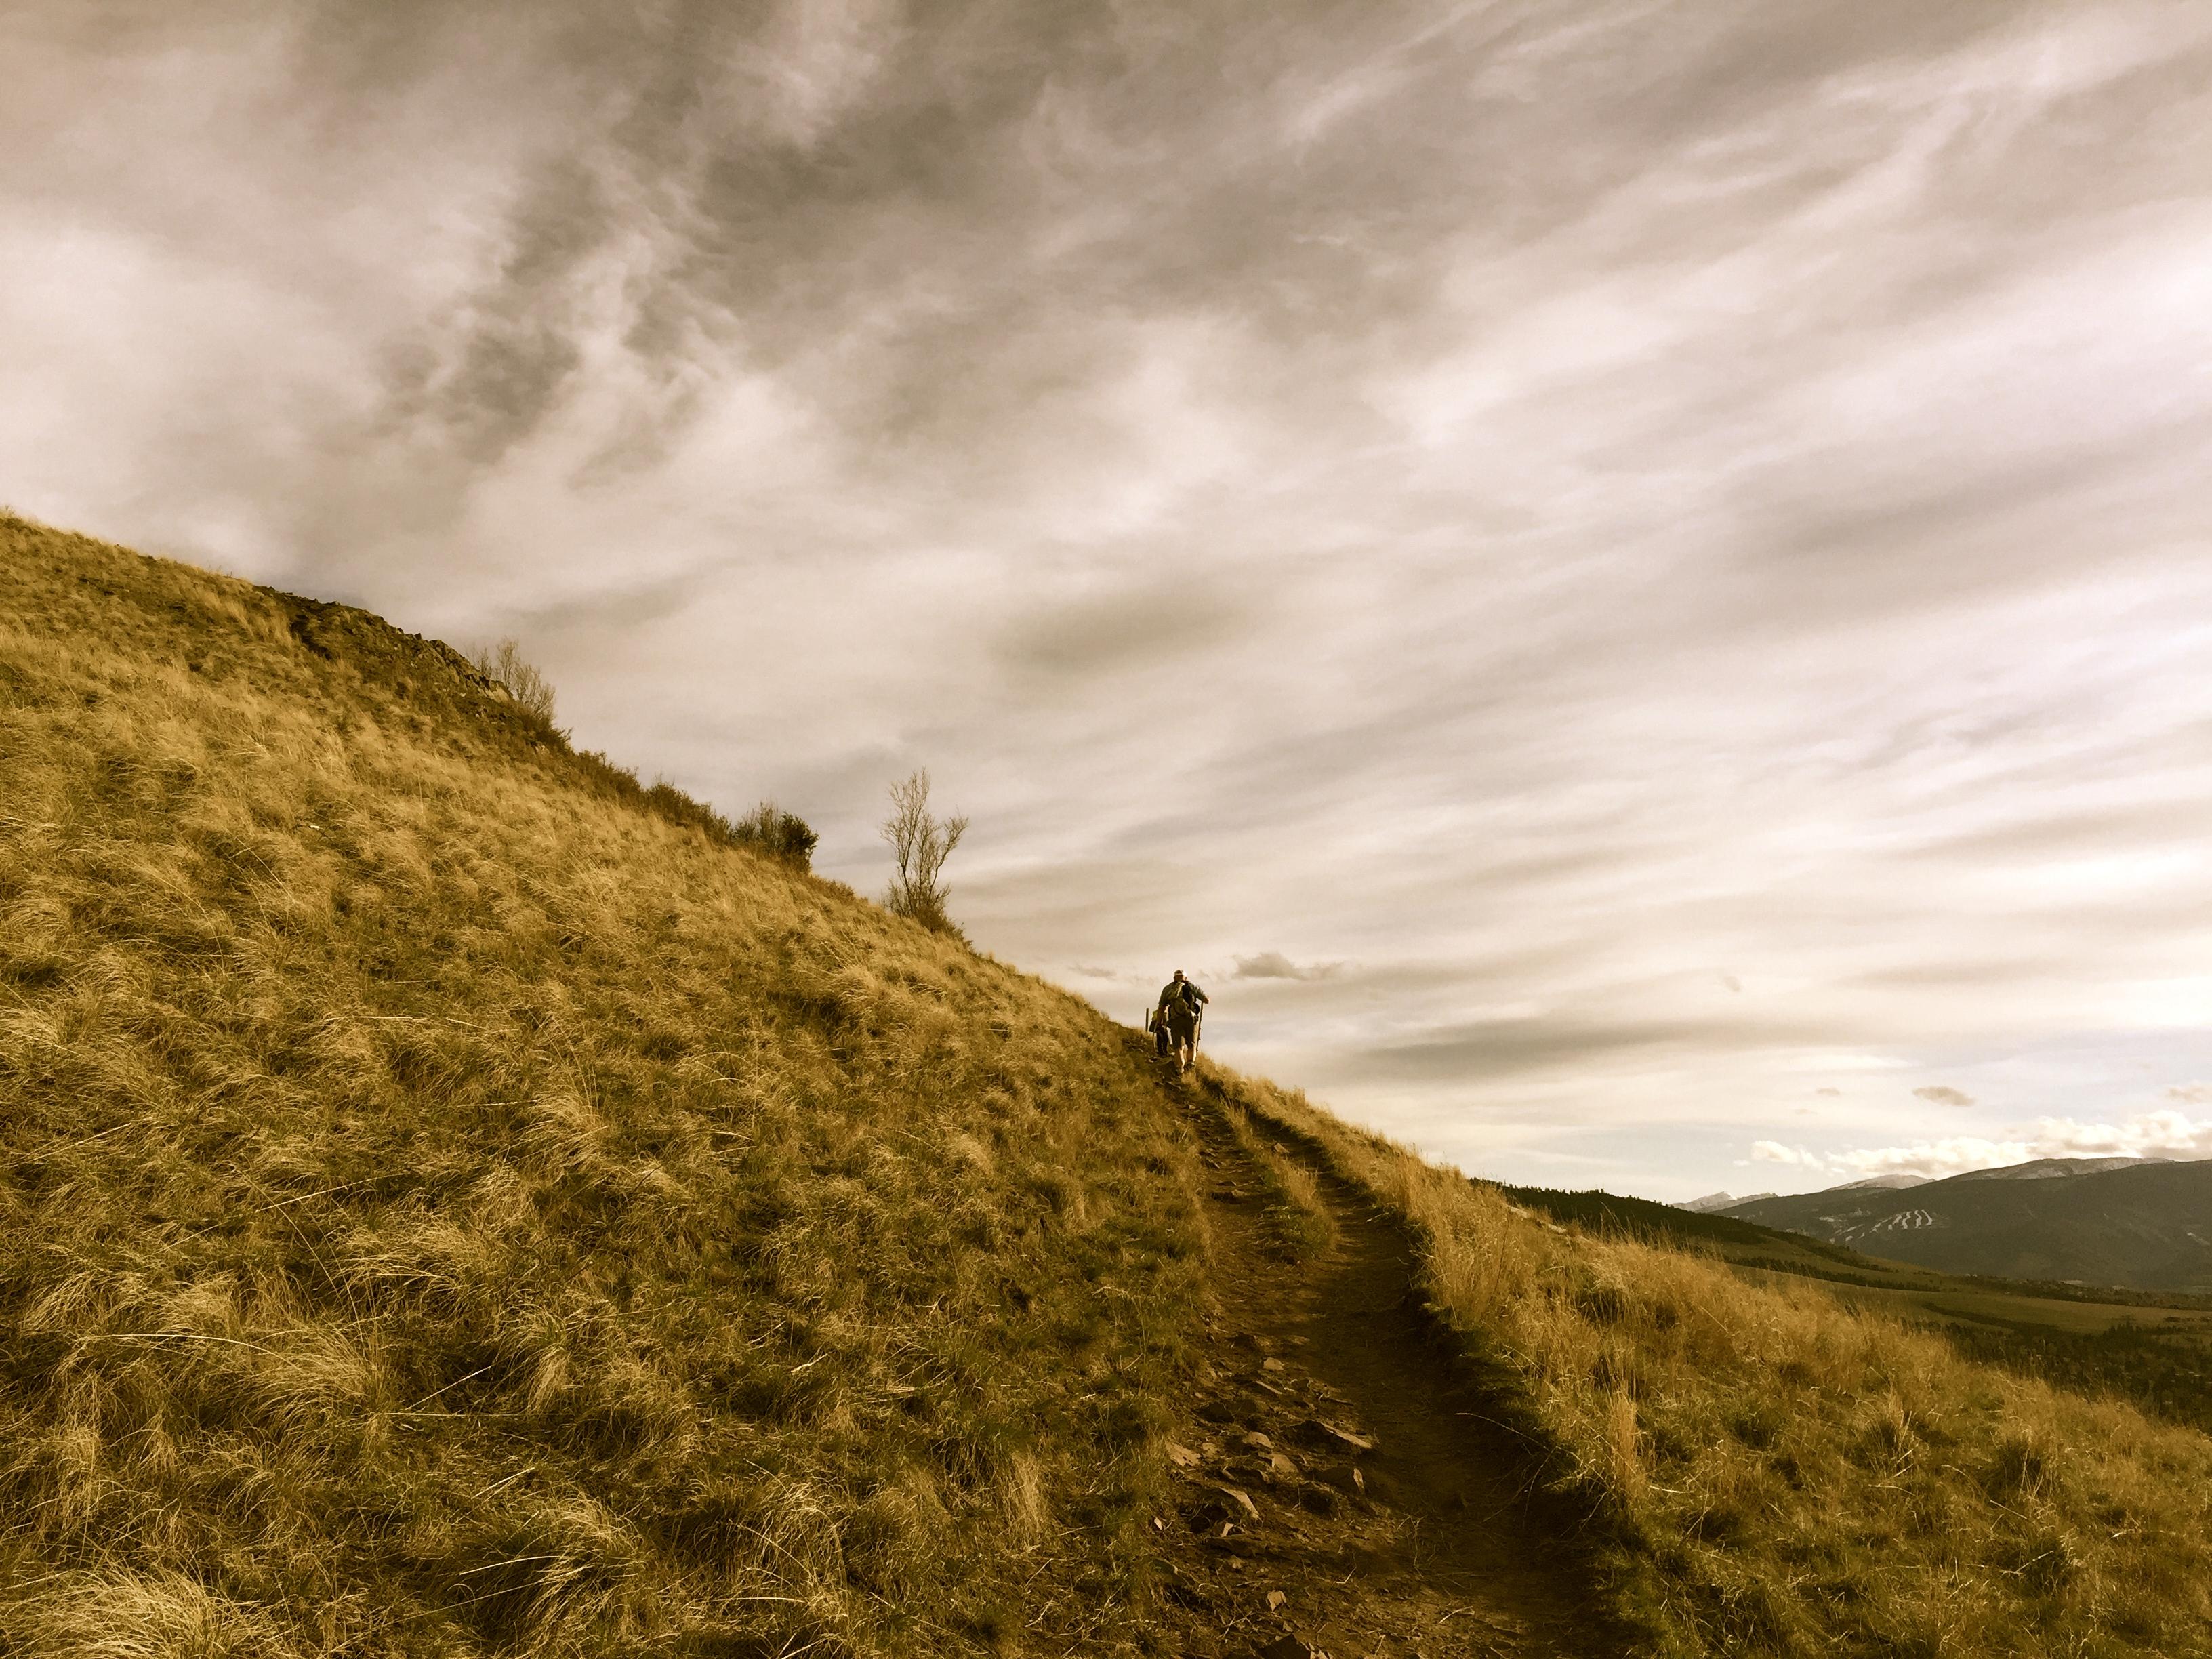 Jesus, path, follow